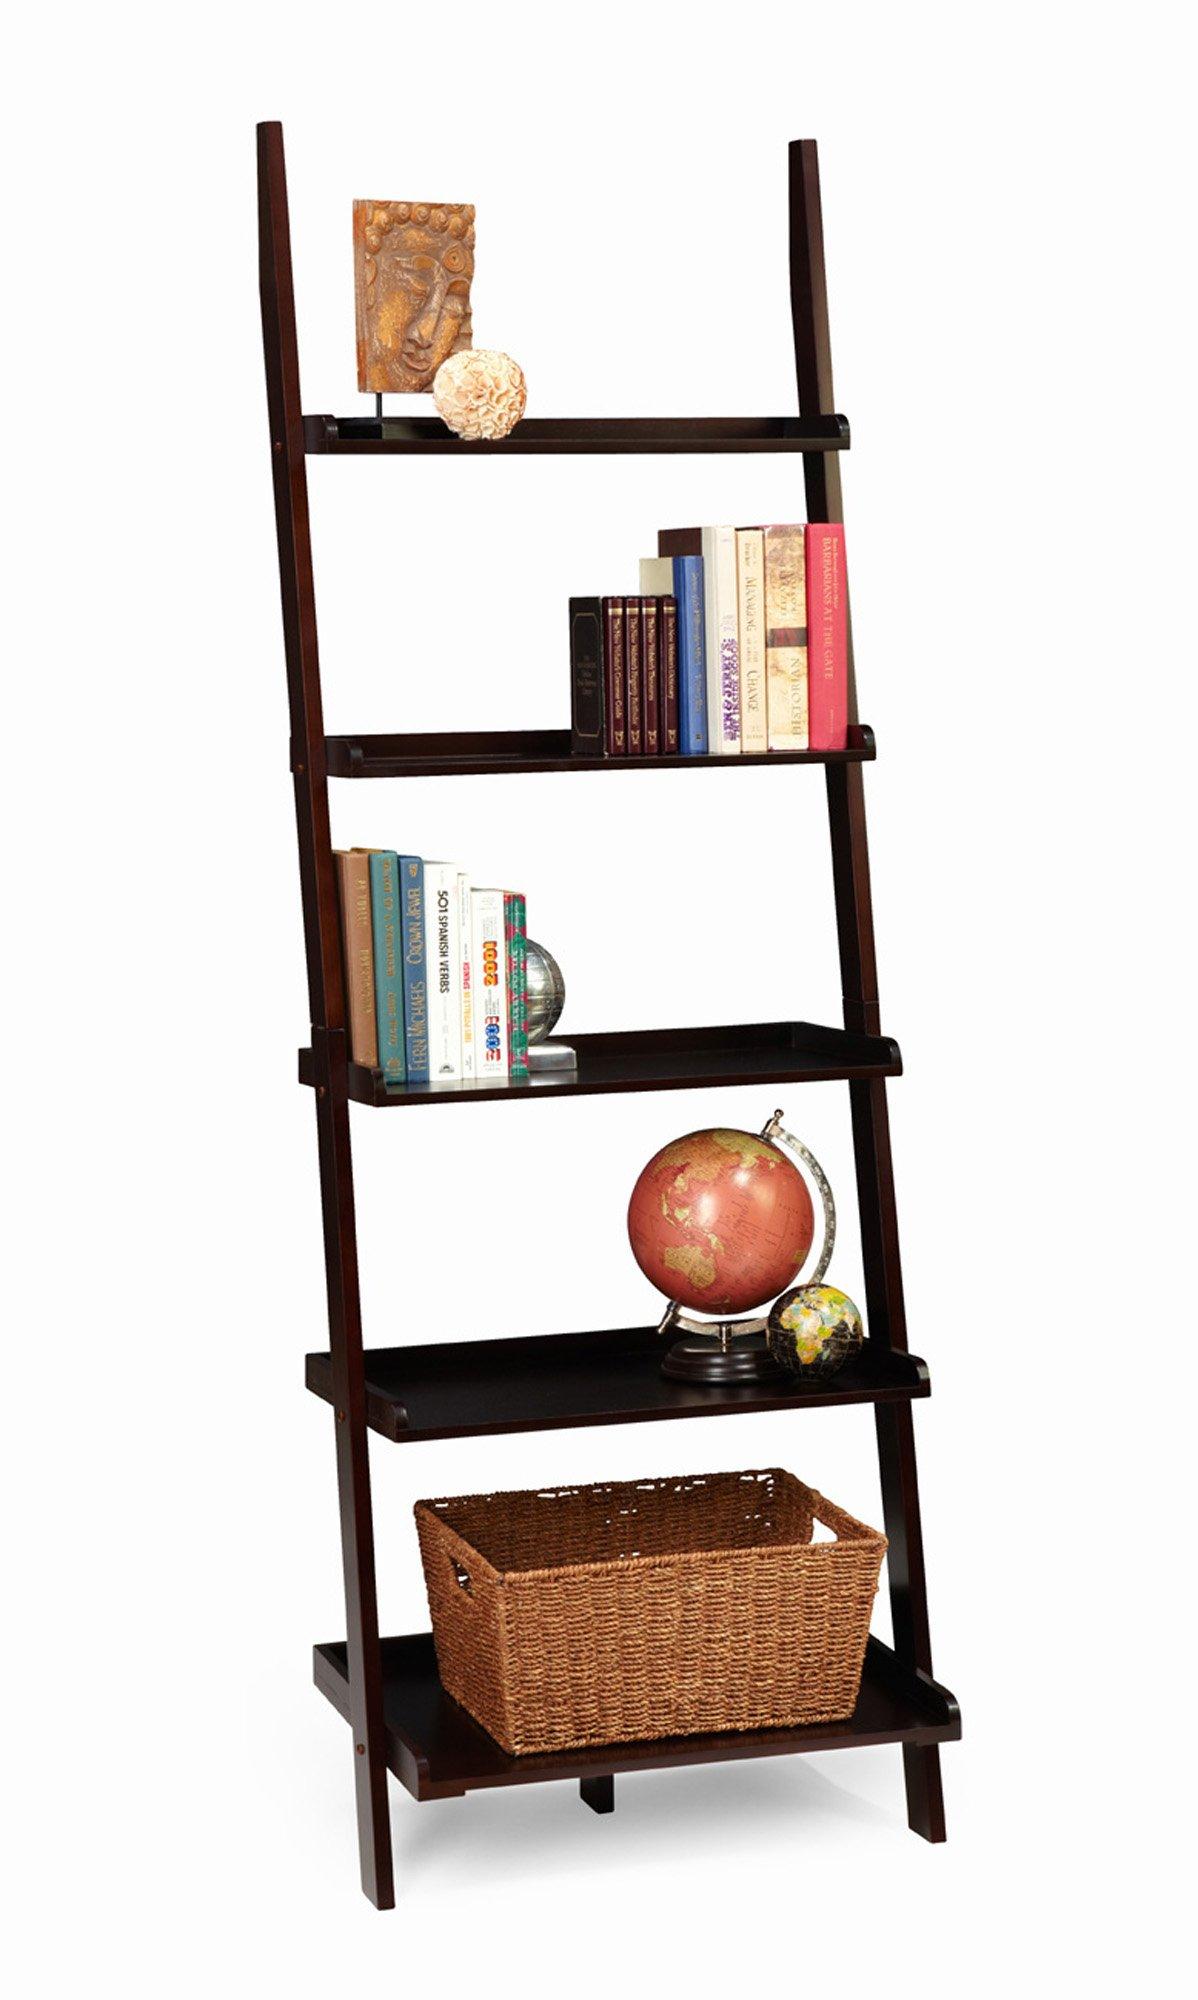 Convenience Concepts American Heritage Bookshelf Ladder, Espresso by Convenience Concepts